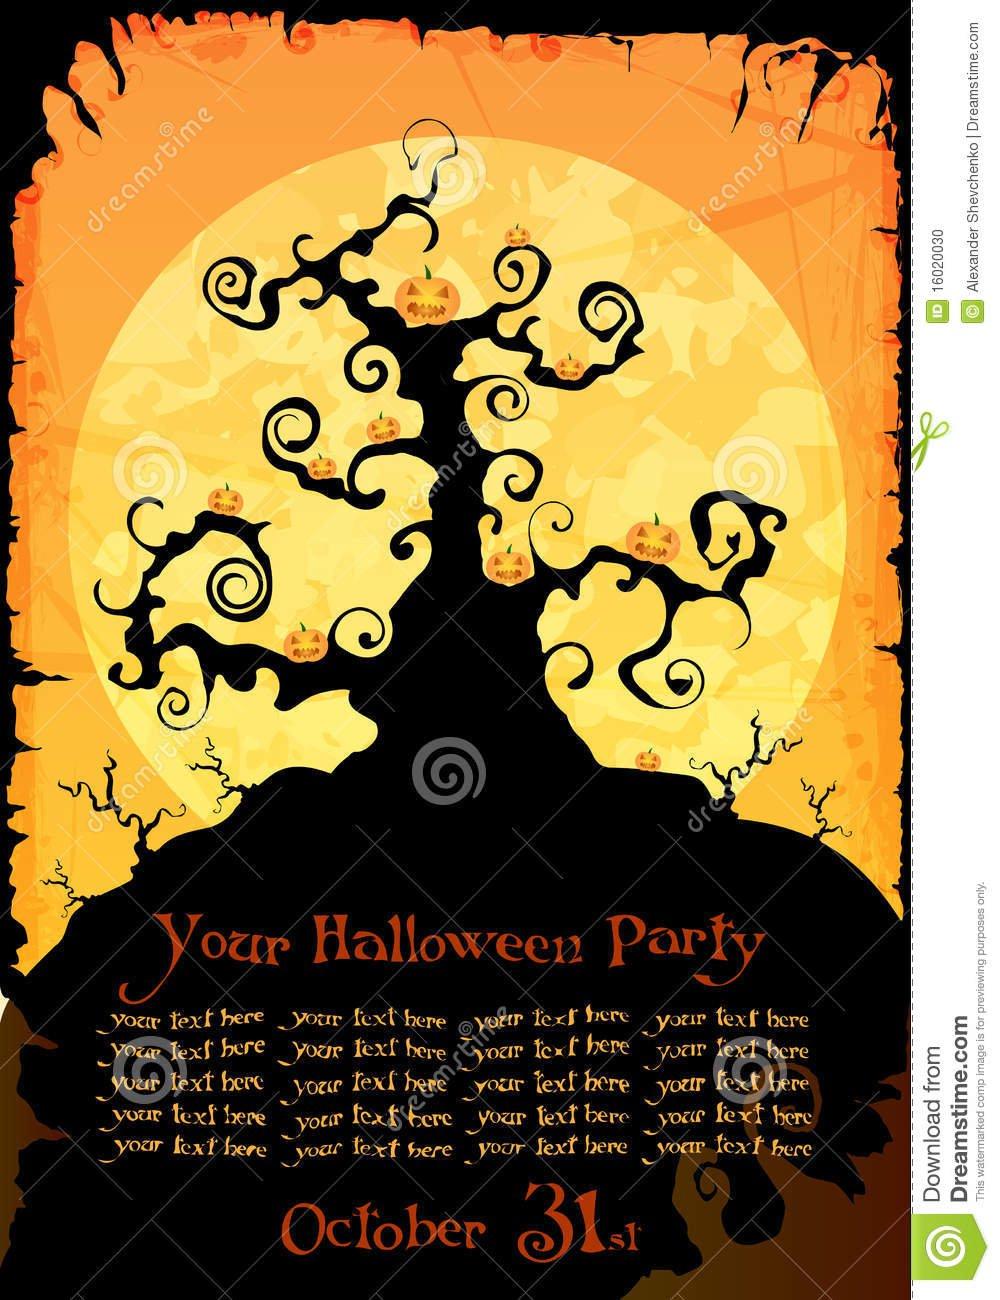 Cool Halloween Invitations